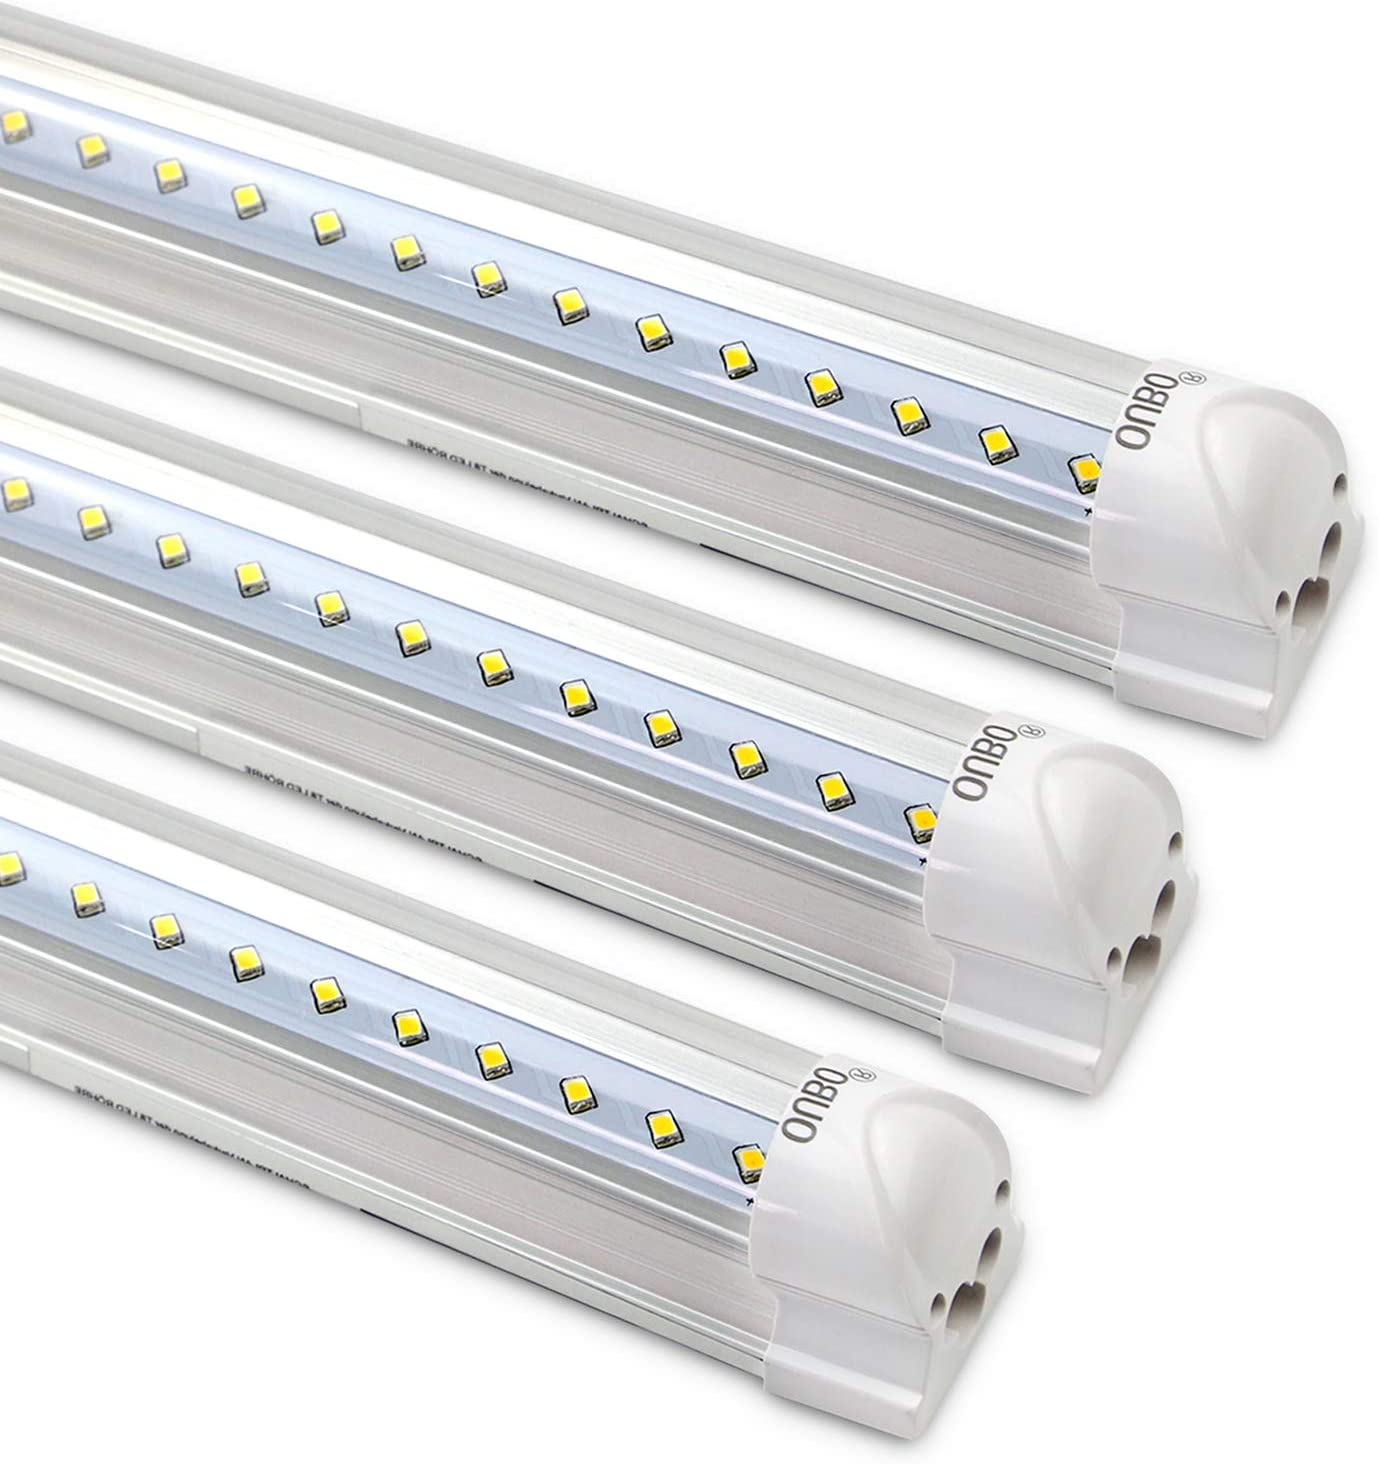 2pcs LED Röhre Tube Leuchtstoffröhre Leuchtstofflampe Lichtleiste Lampe 120cm